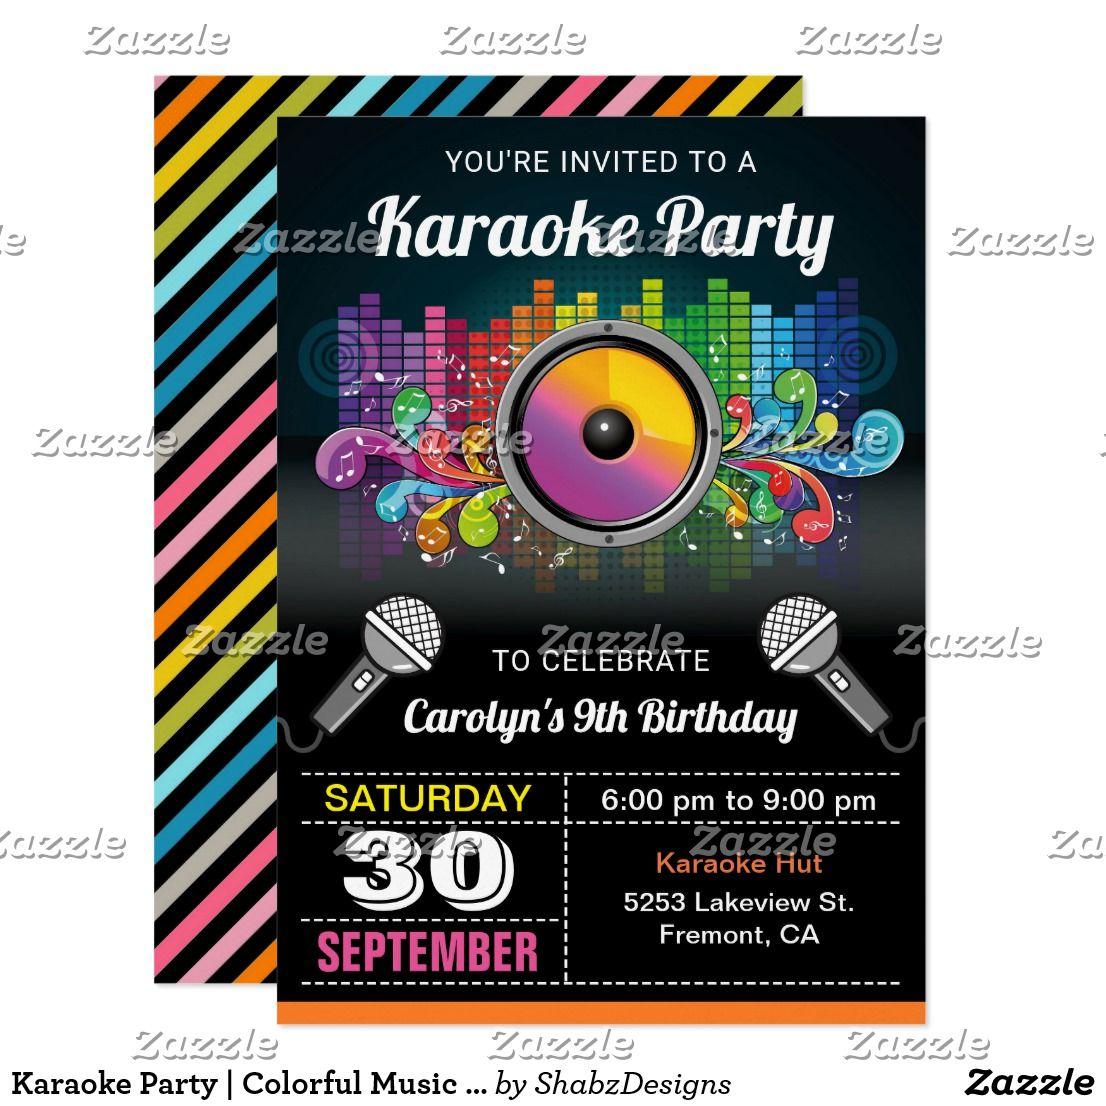 Karaoke party colorful music birthday invitation karaoke party karaoke party colorful music birthday invitation monicamarmolfo Image collections